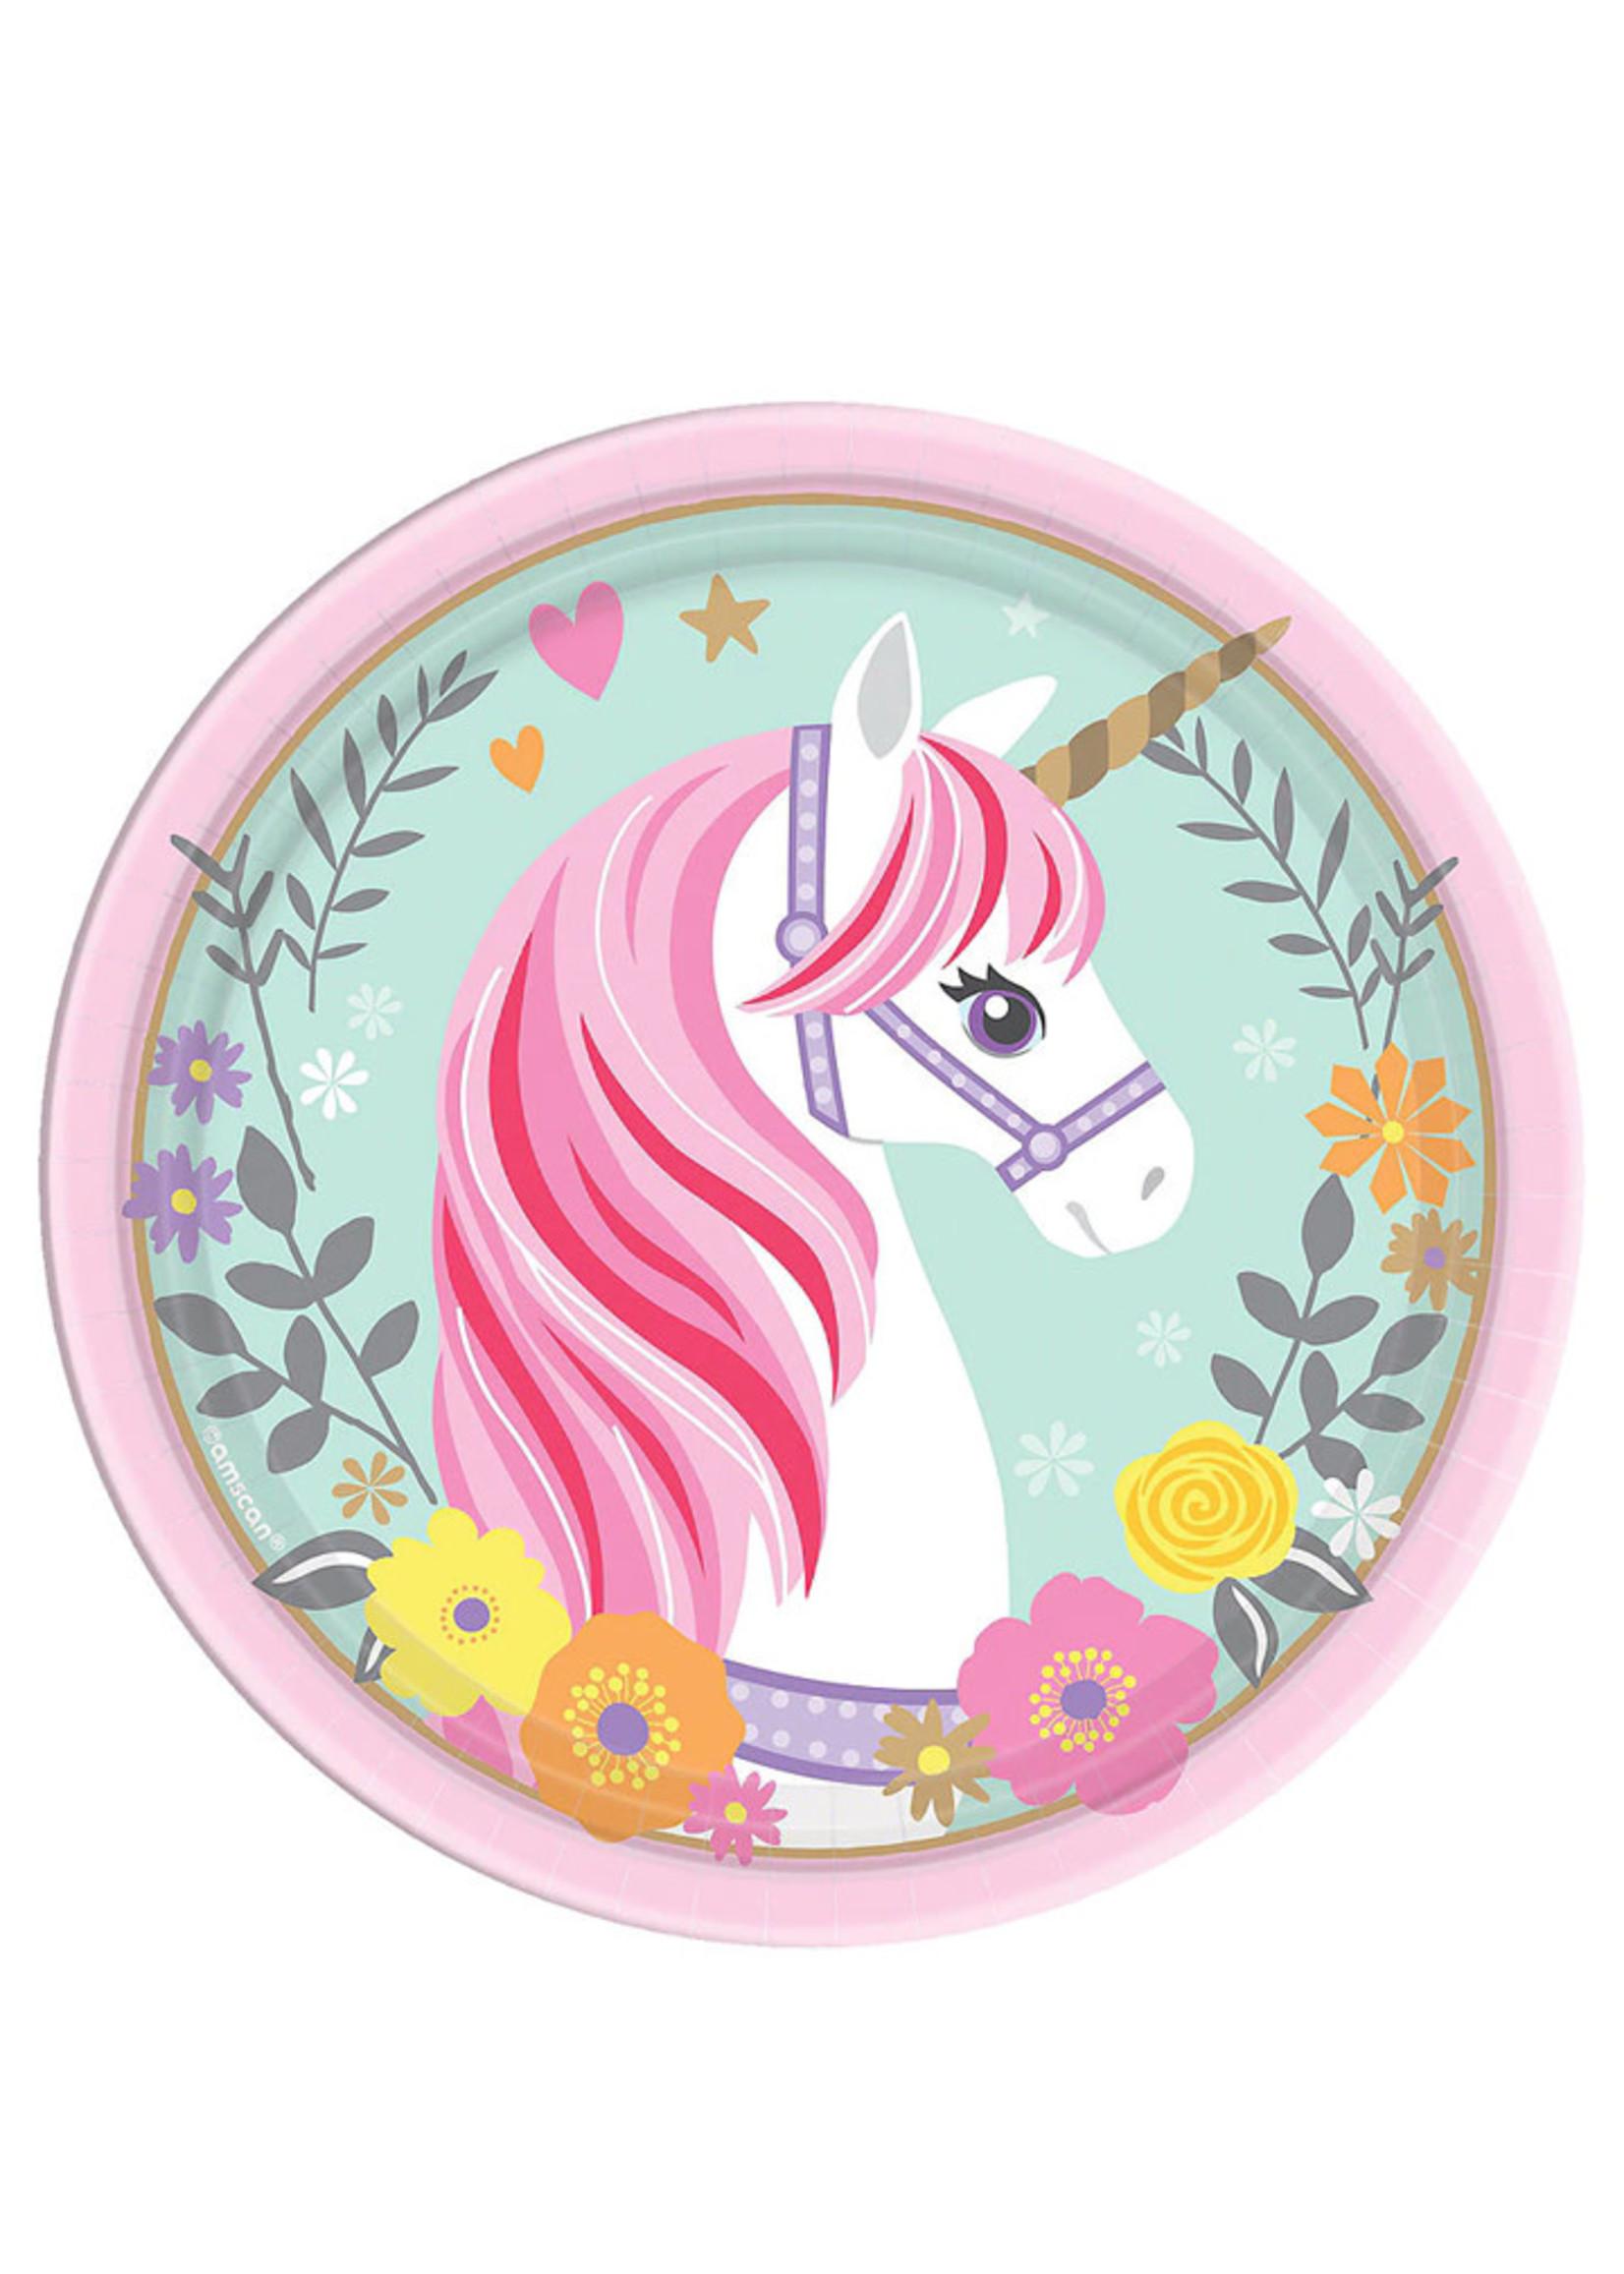 Magical Unicorn Dessert Plates -  8ct